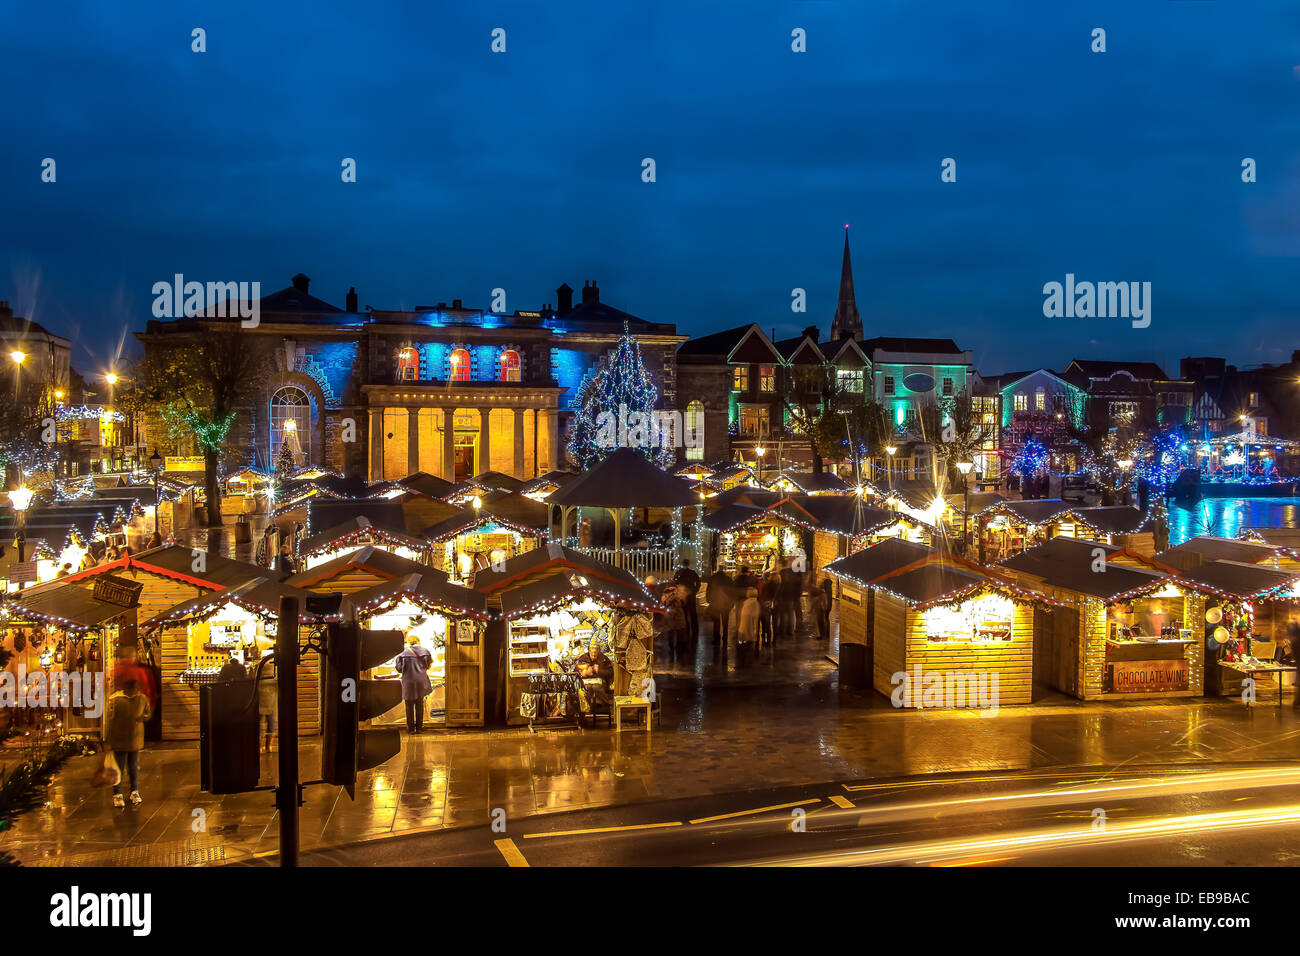 salisbury-27th-november-2014-salisbury-christmas-market-openning-night-EB9BAC.jpg